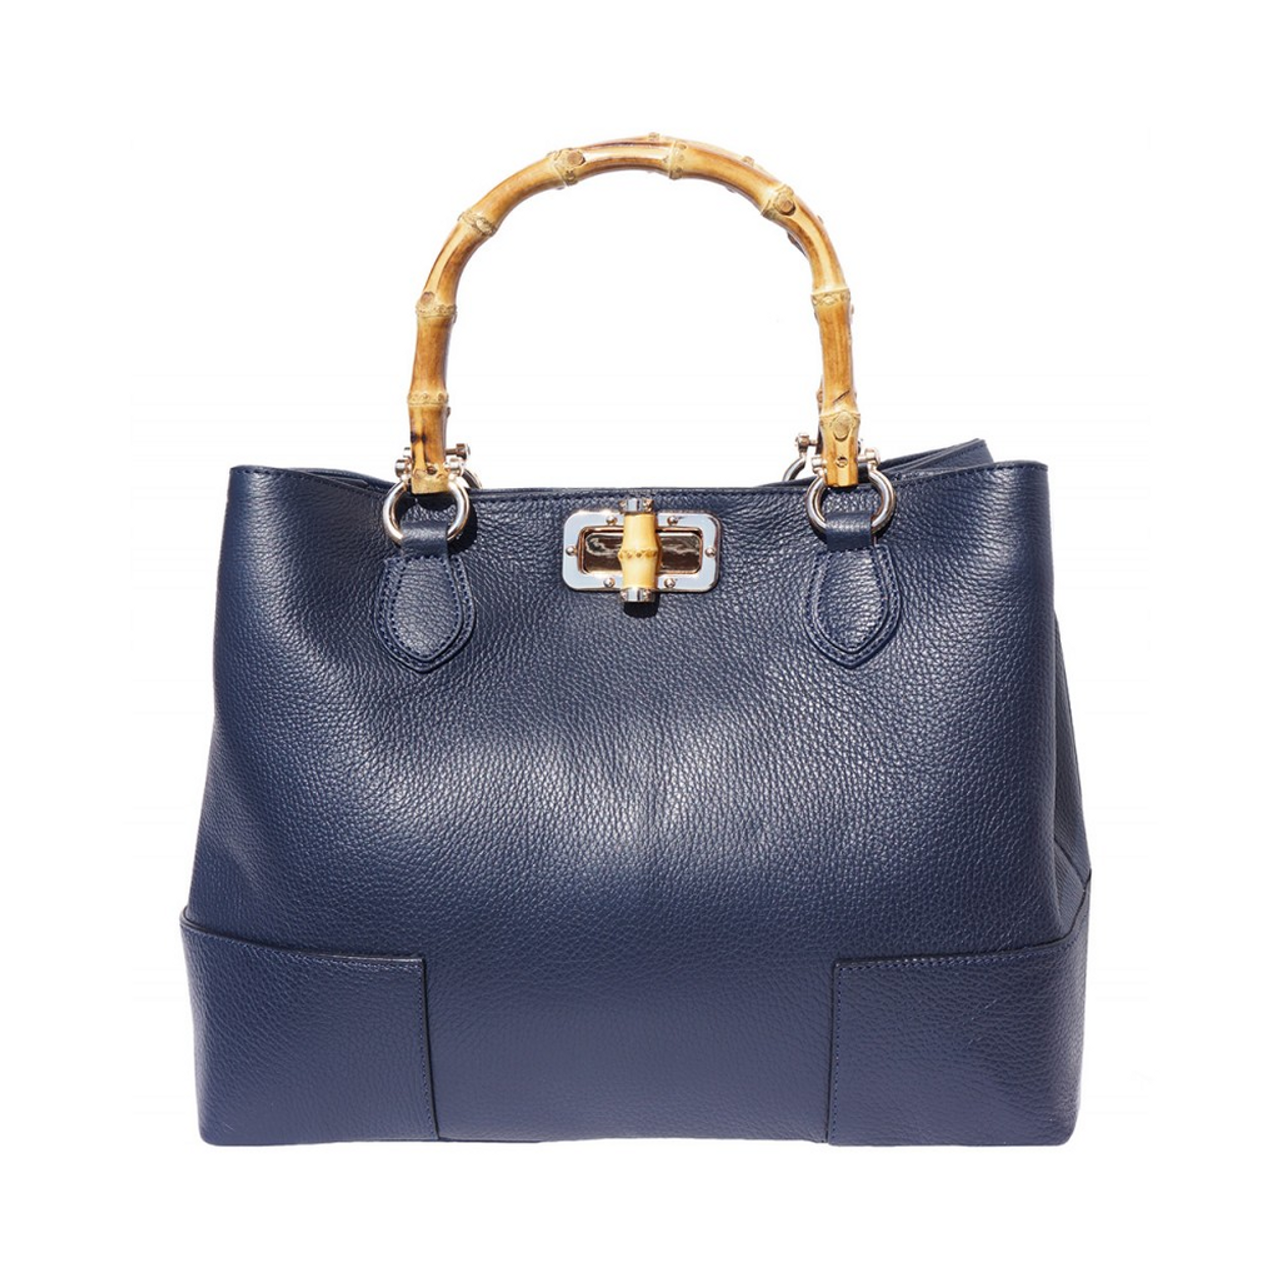 Italian Leather Collection Fabrizia Pebbled Handbag Bamboo Handles